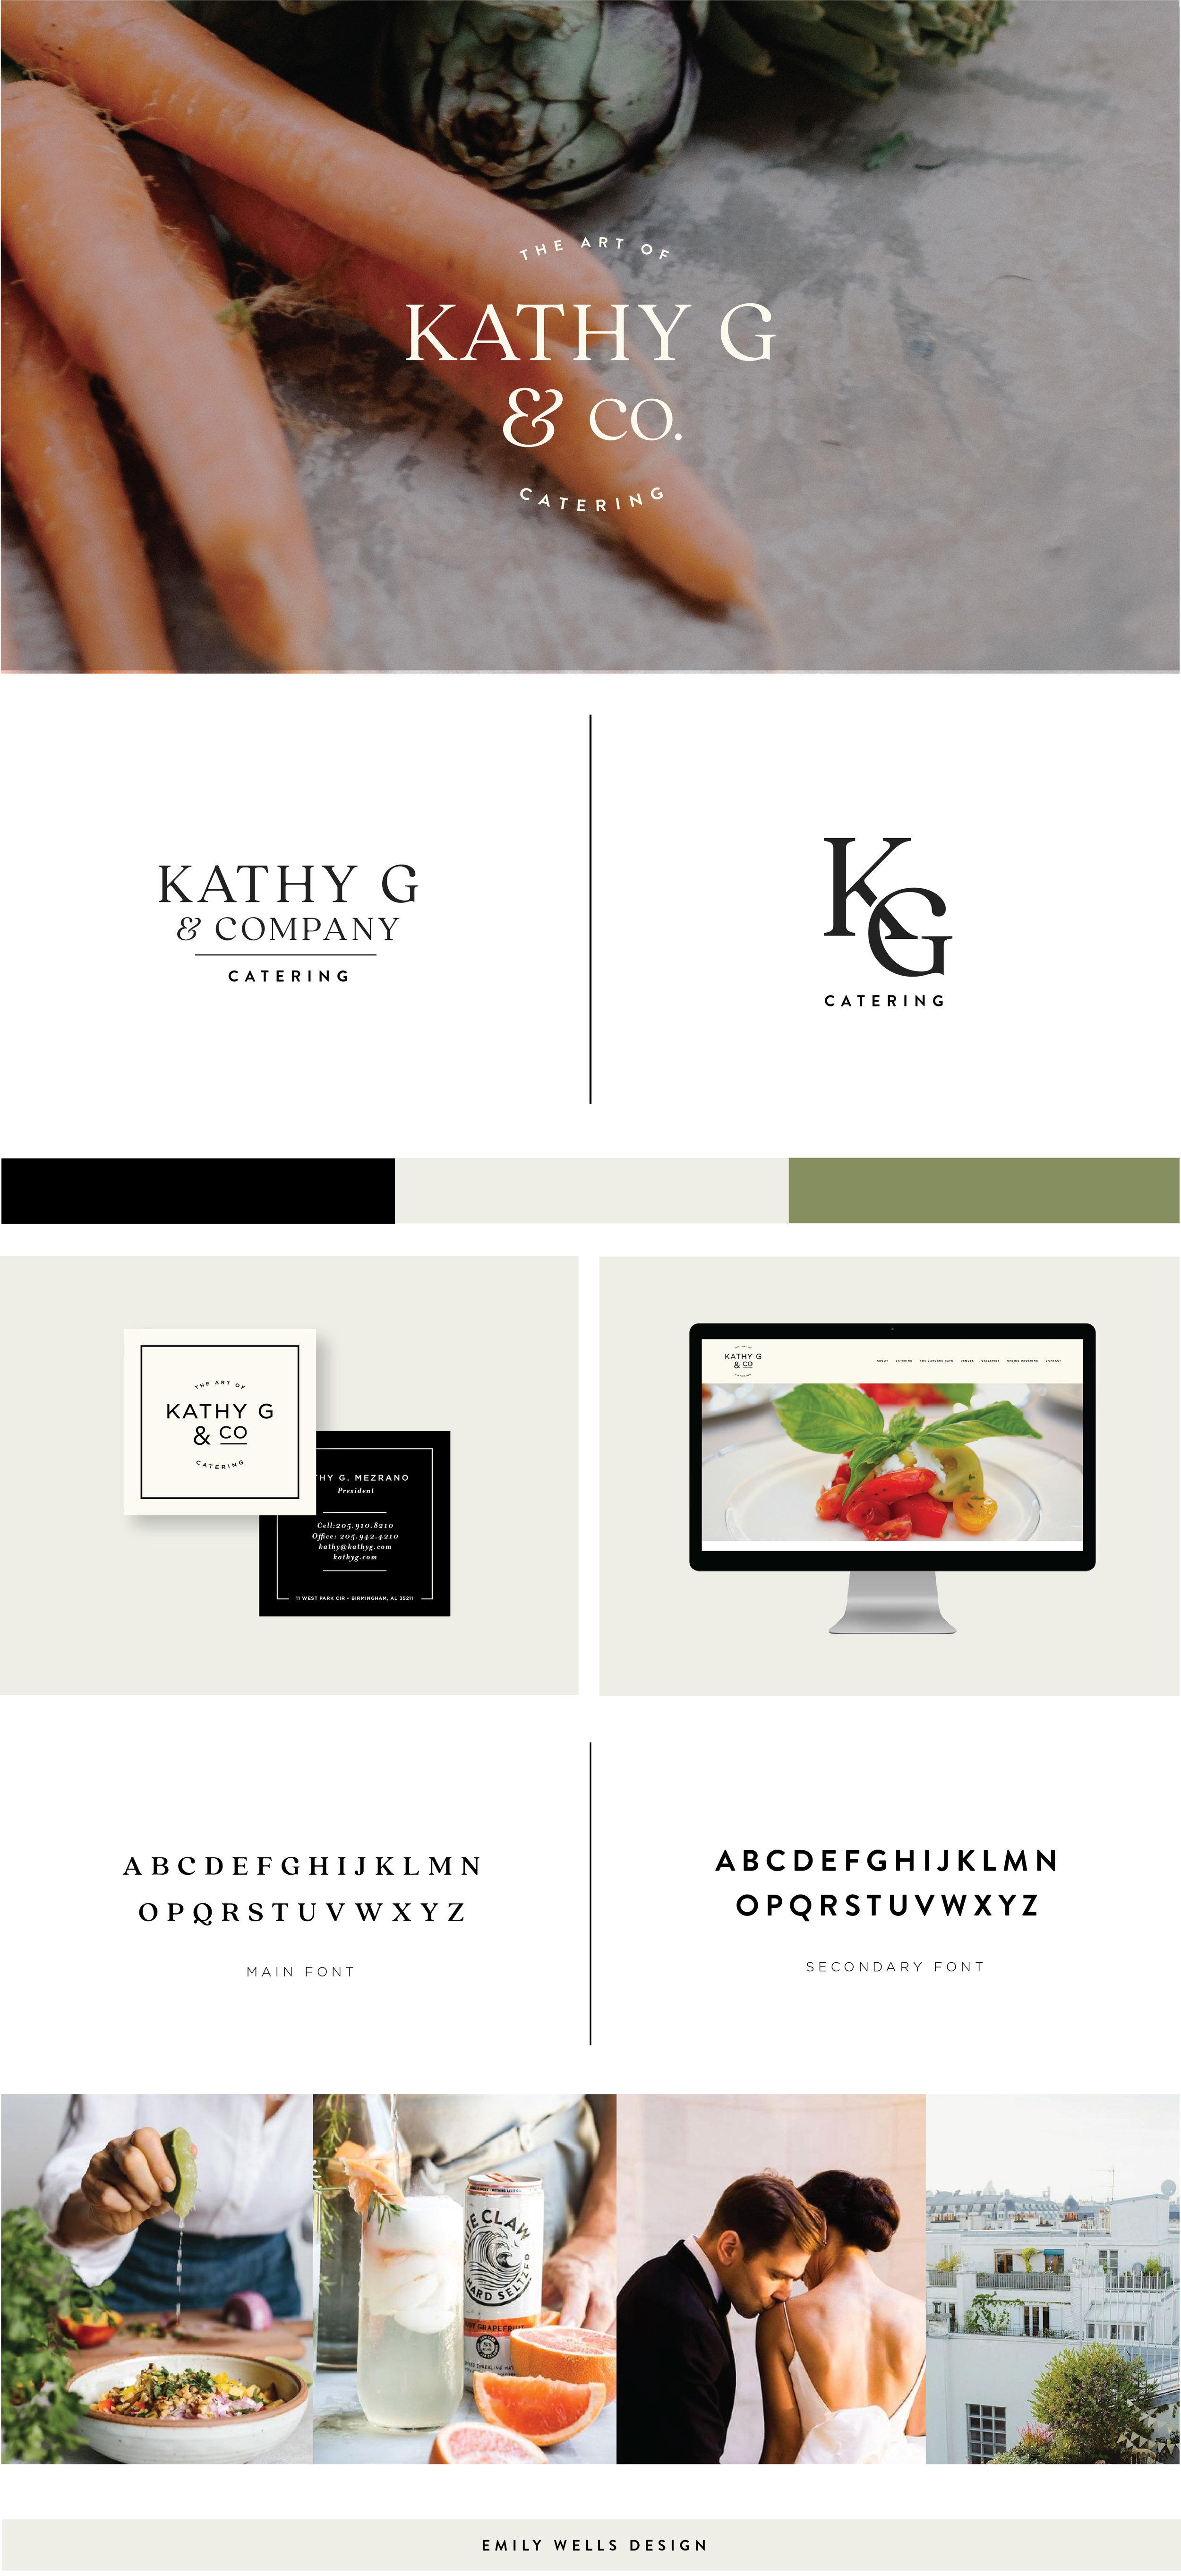 Kathy-G-01.jpg